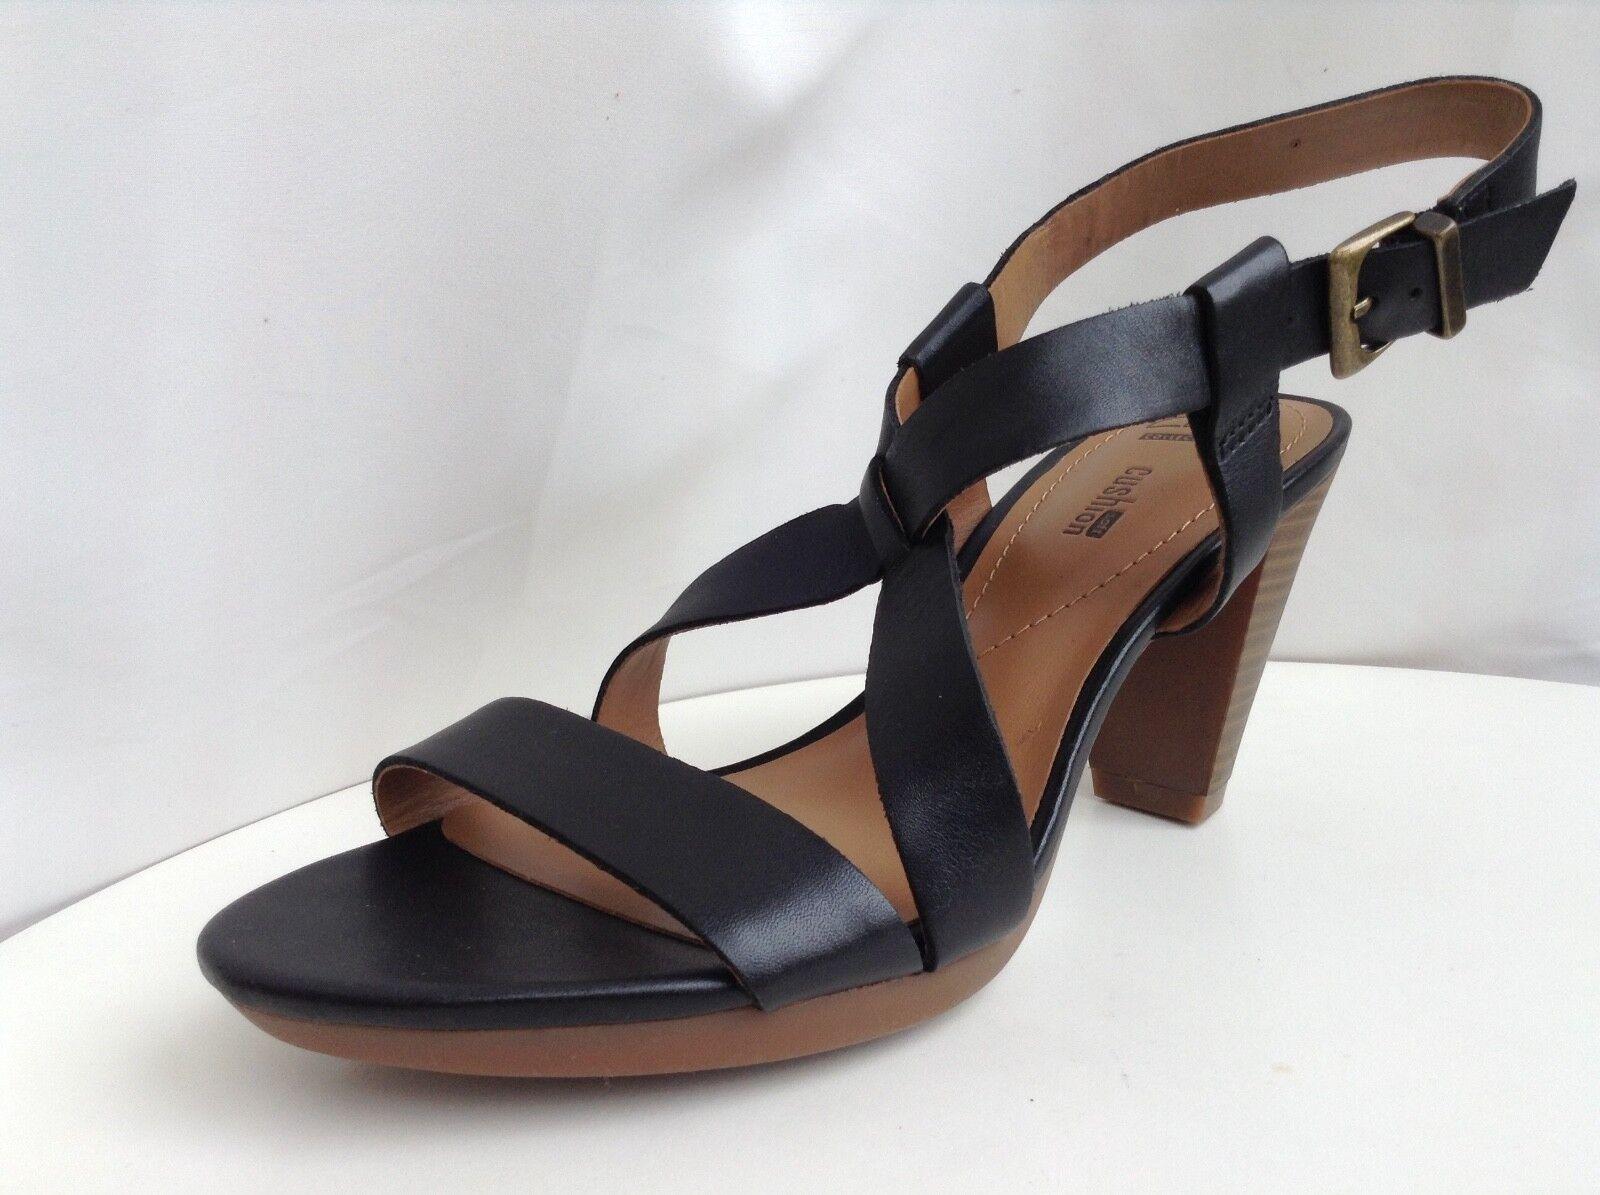 Clarks Womens Jaelyn Fog Black Leather Sandals size UK 5.5D